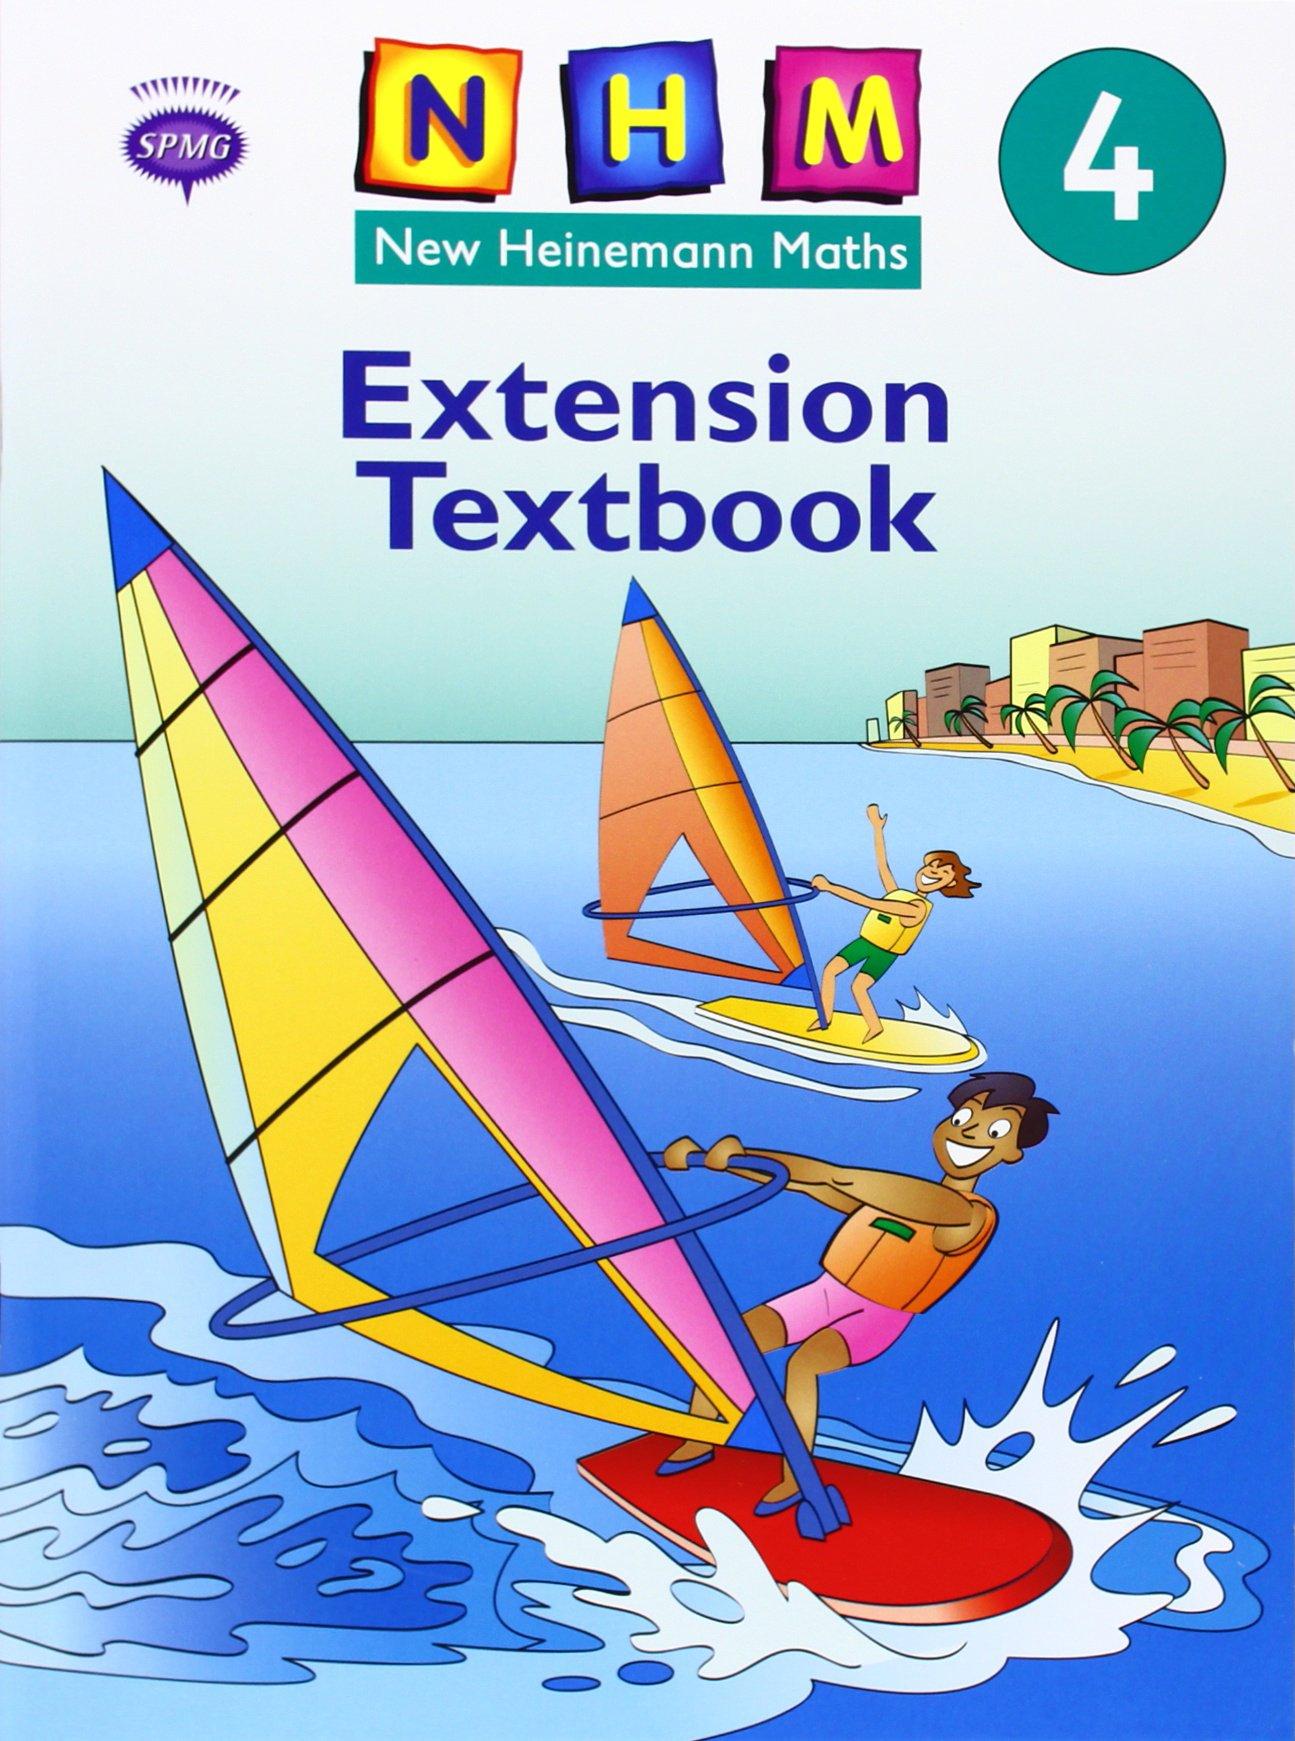 New Heinemann Maths Yr4, Extension Textbook PDF